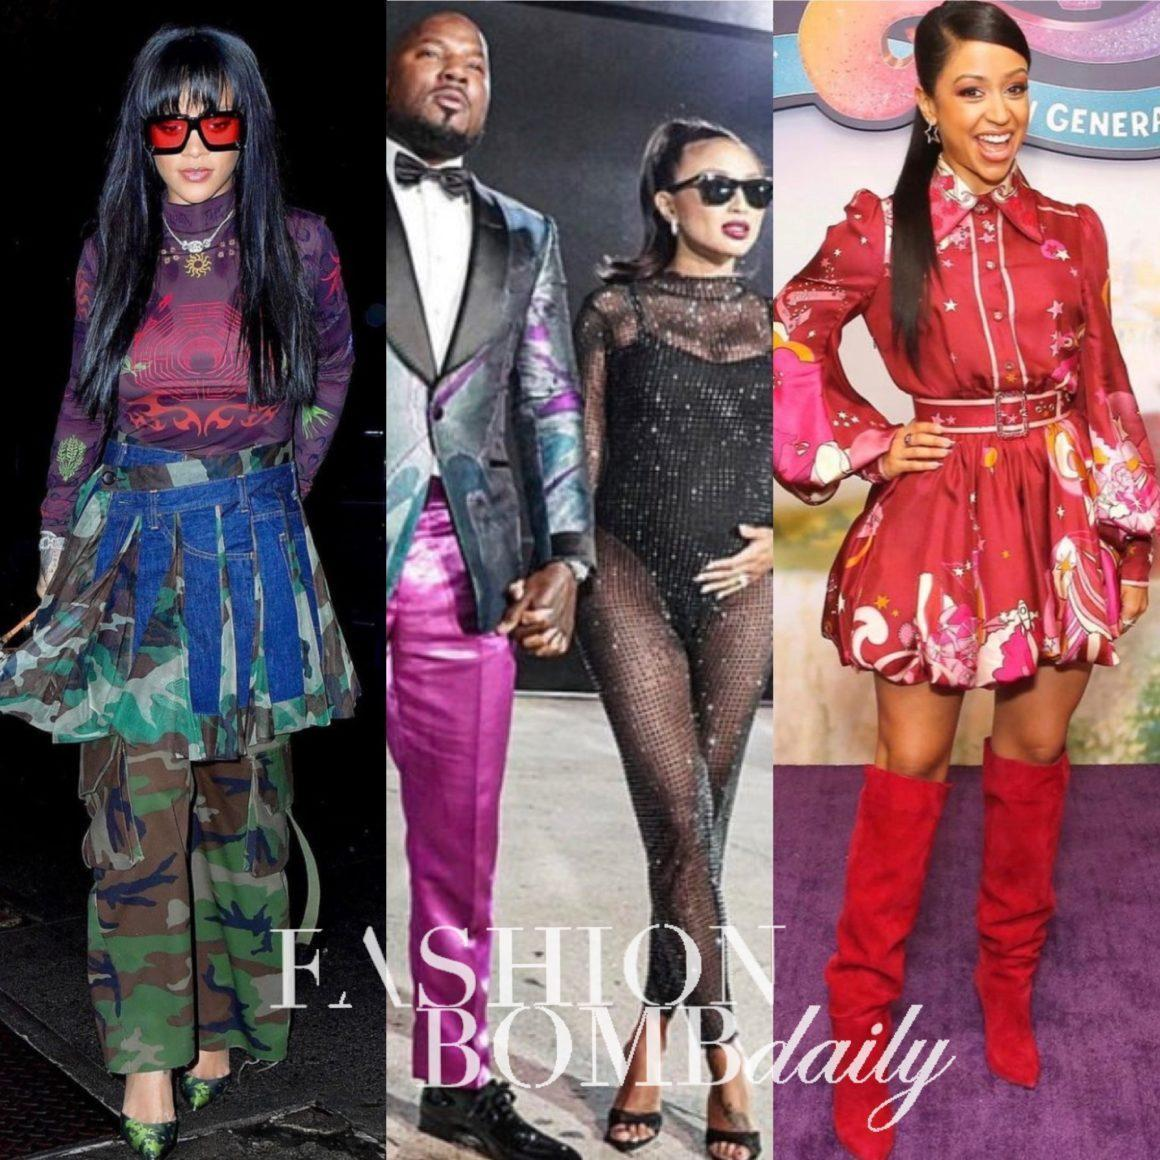 Look of the Week: Jeezy in Teó Flor and Jeannie Mai in Tata LA, Rihanna in Marine Serre and Junya Watanabe, Liza Koshy in Zimmermann + More